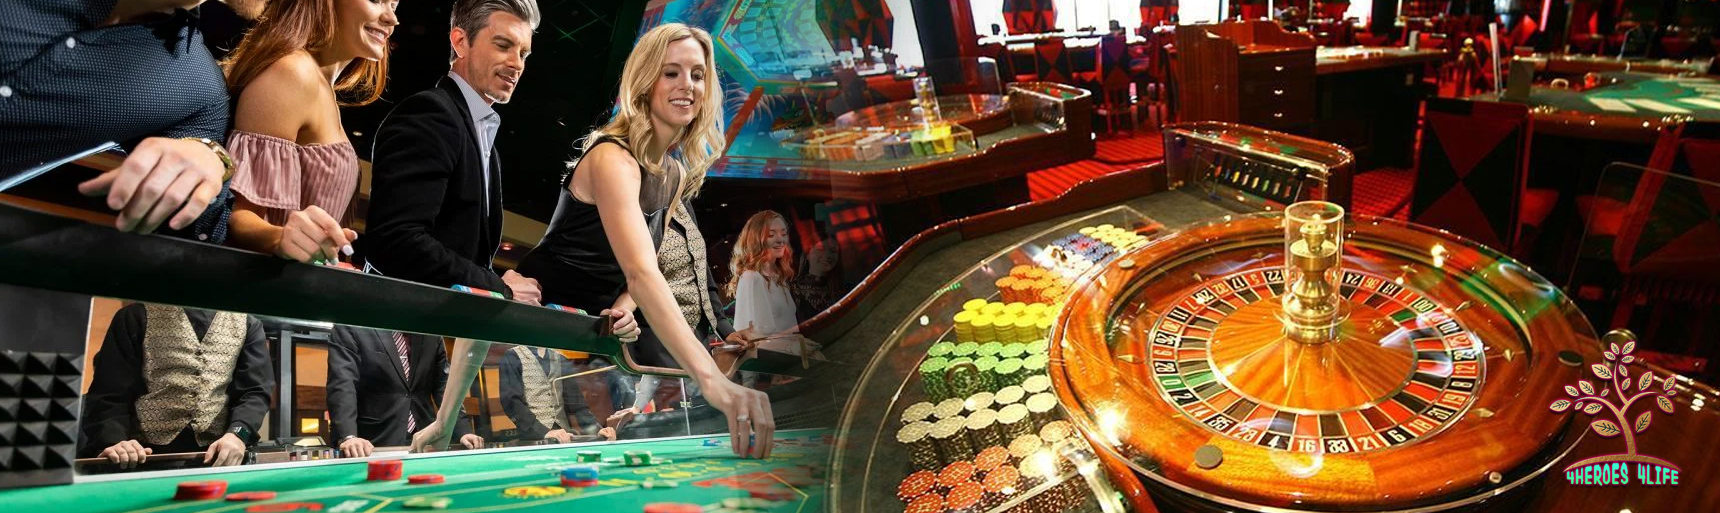 Mengenal casino online